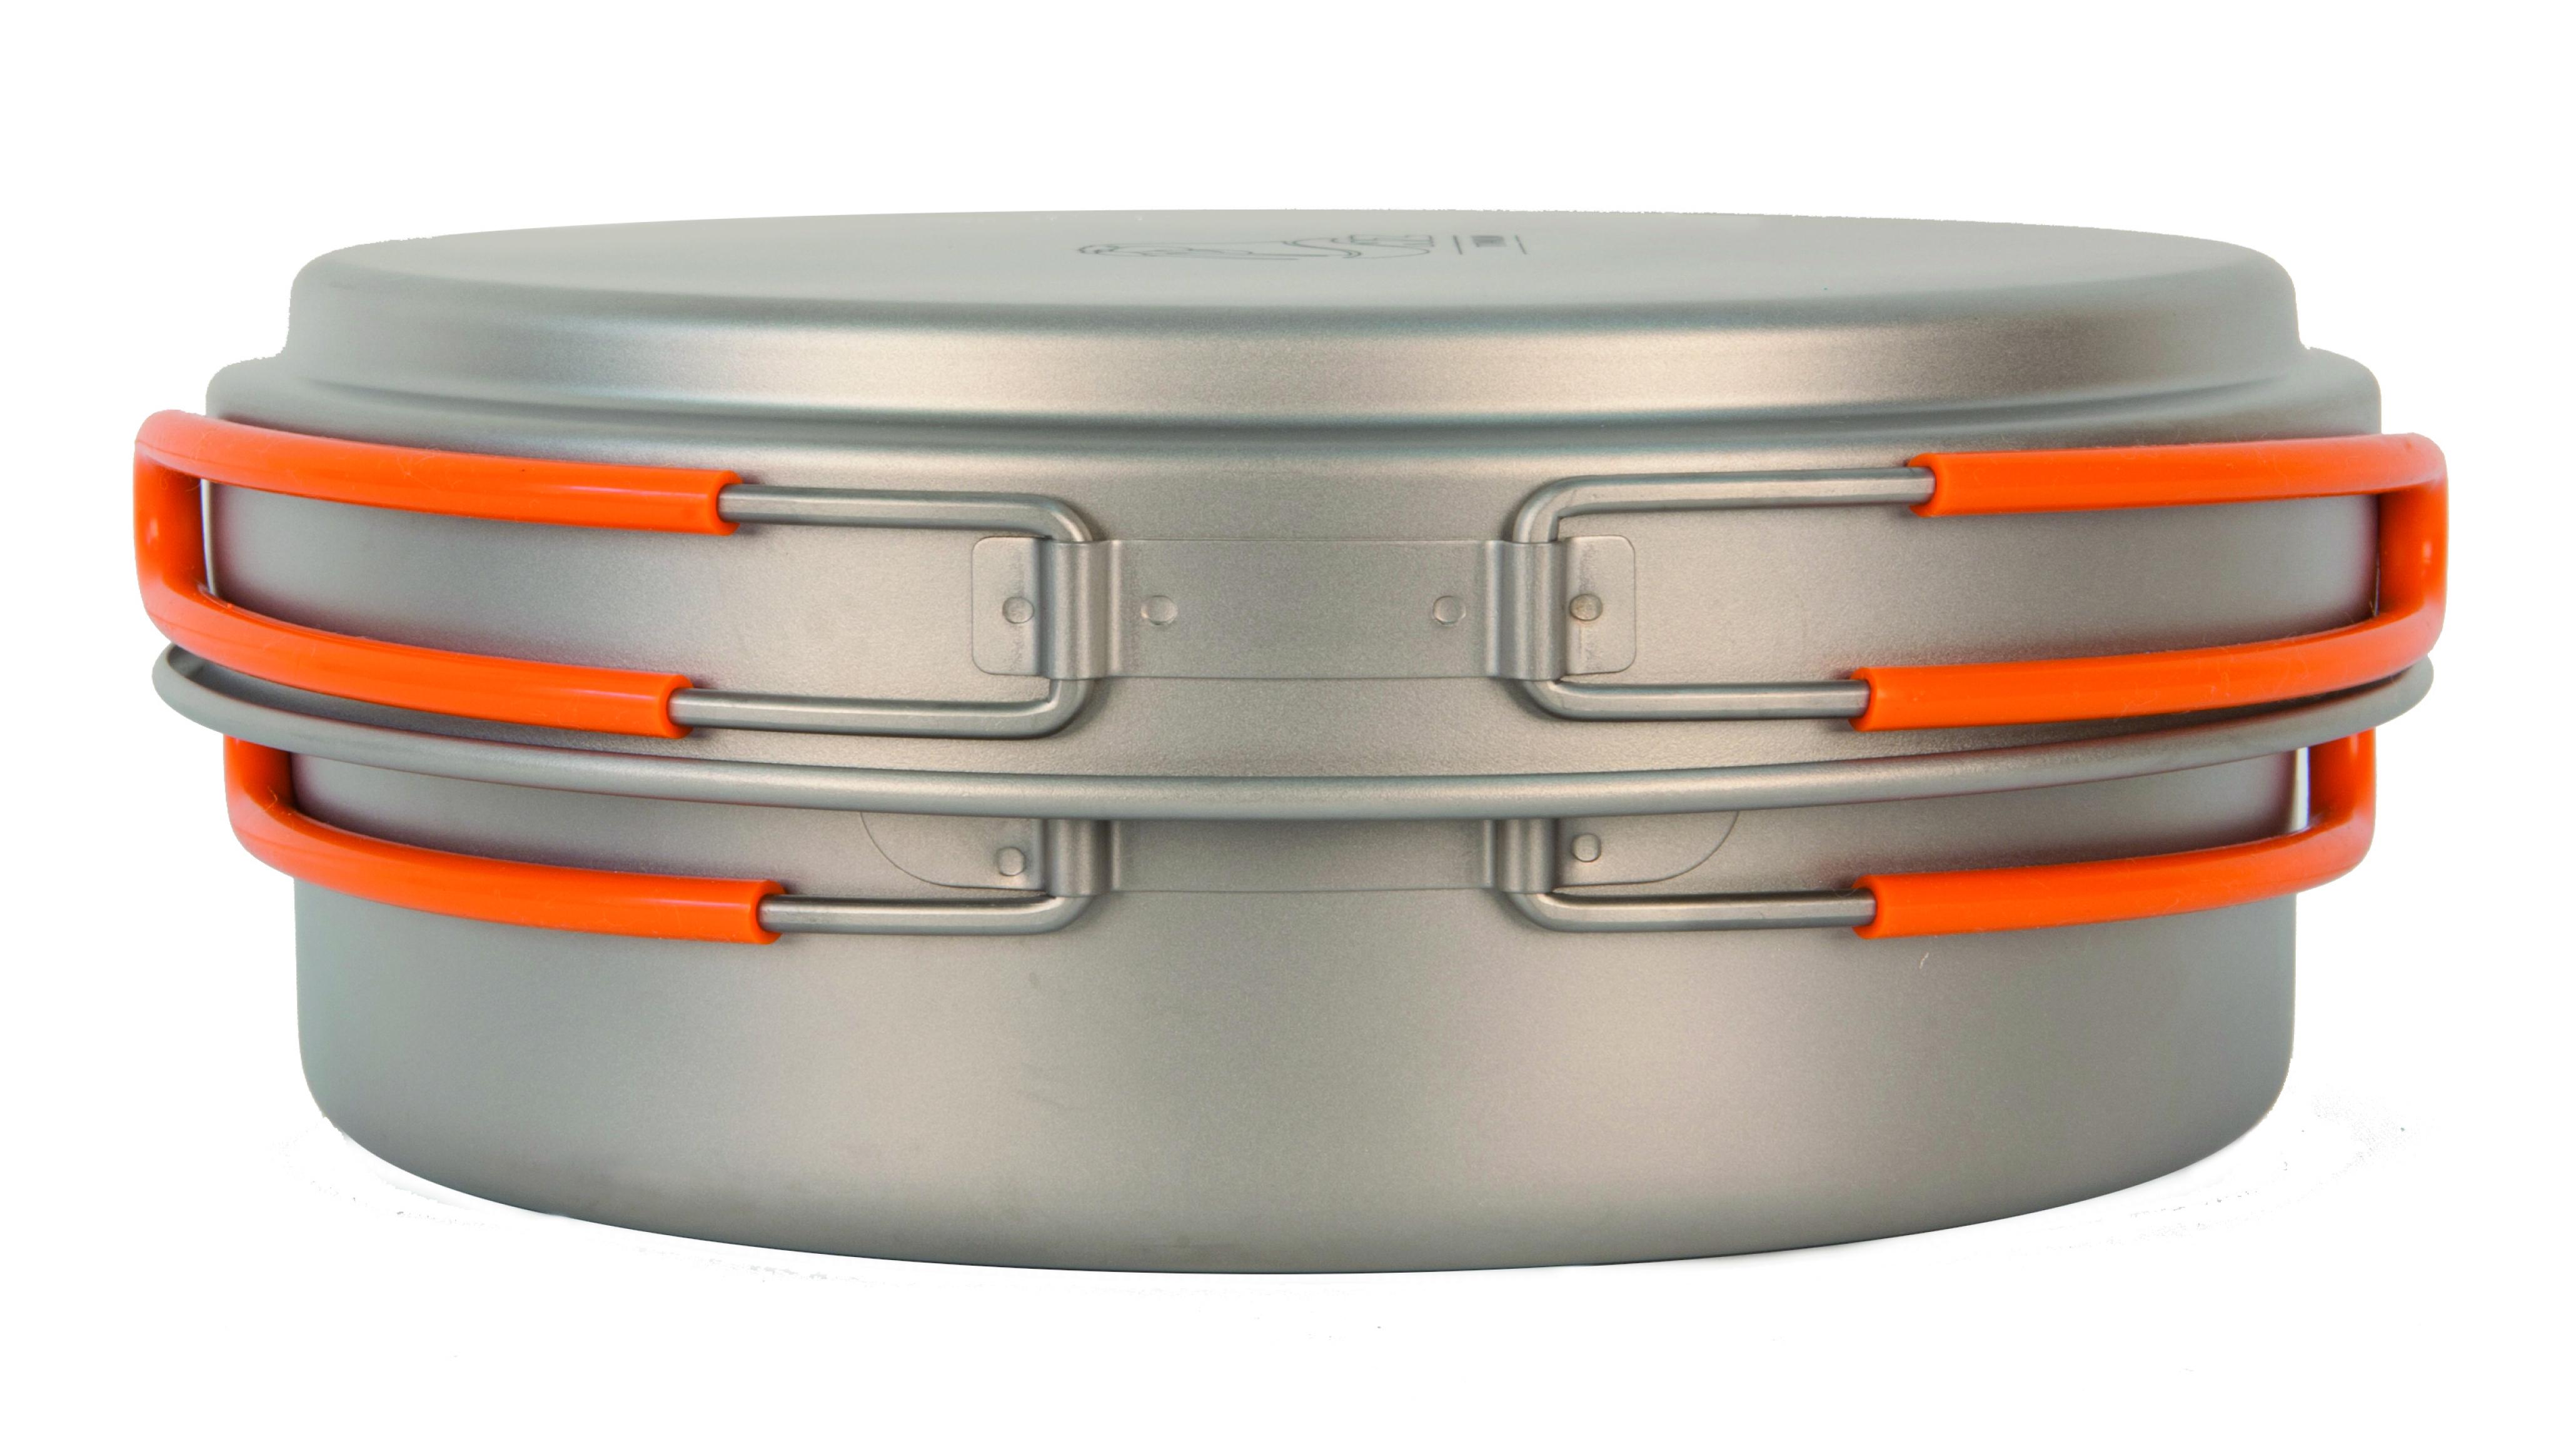 Кастрюля с крышкой NZ Ti Cookware 1250 ml фото